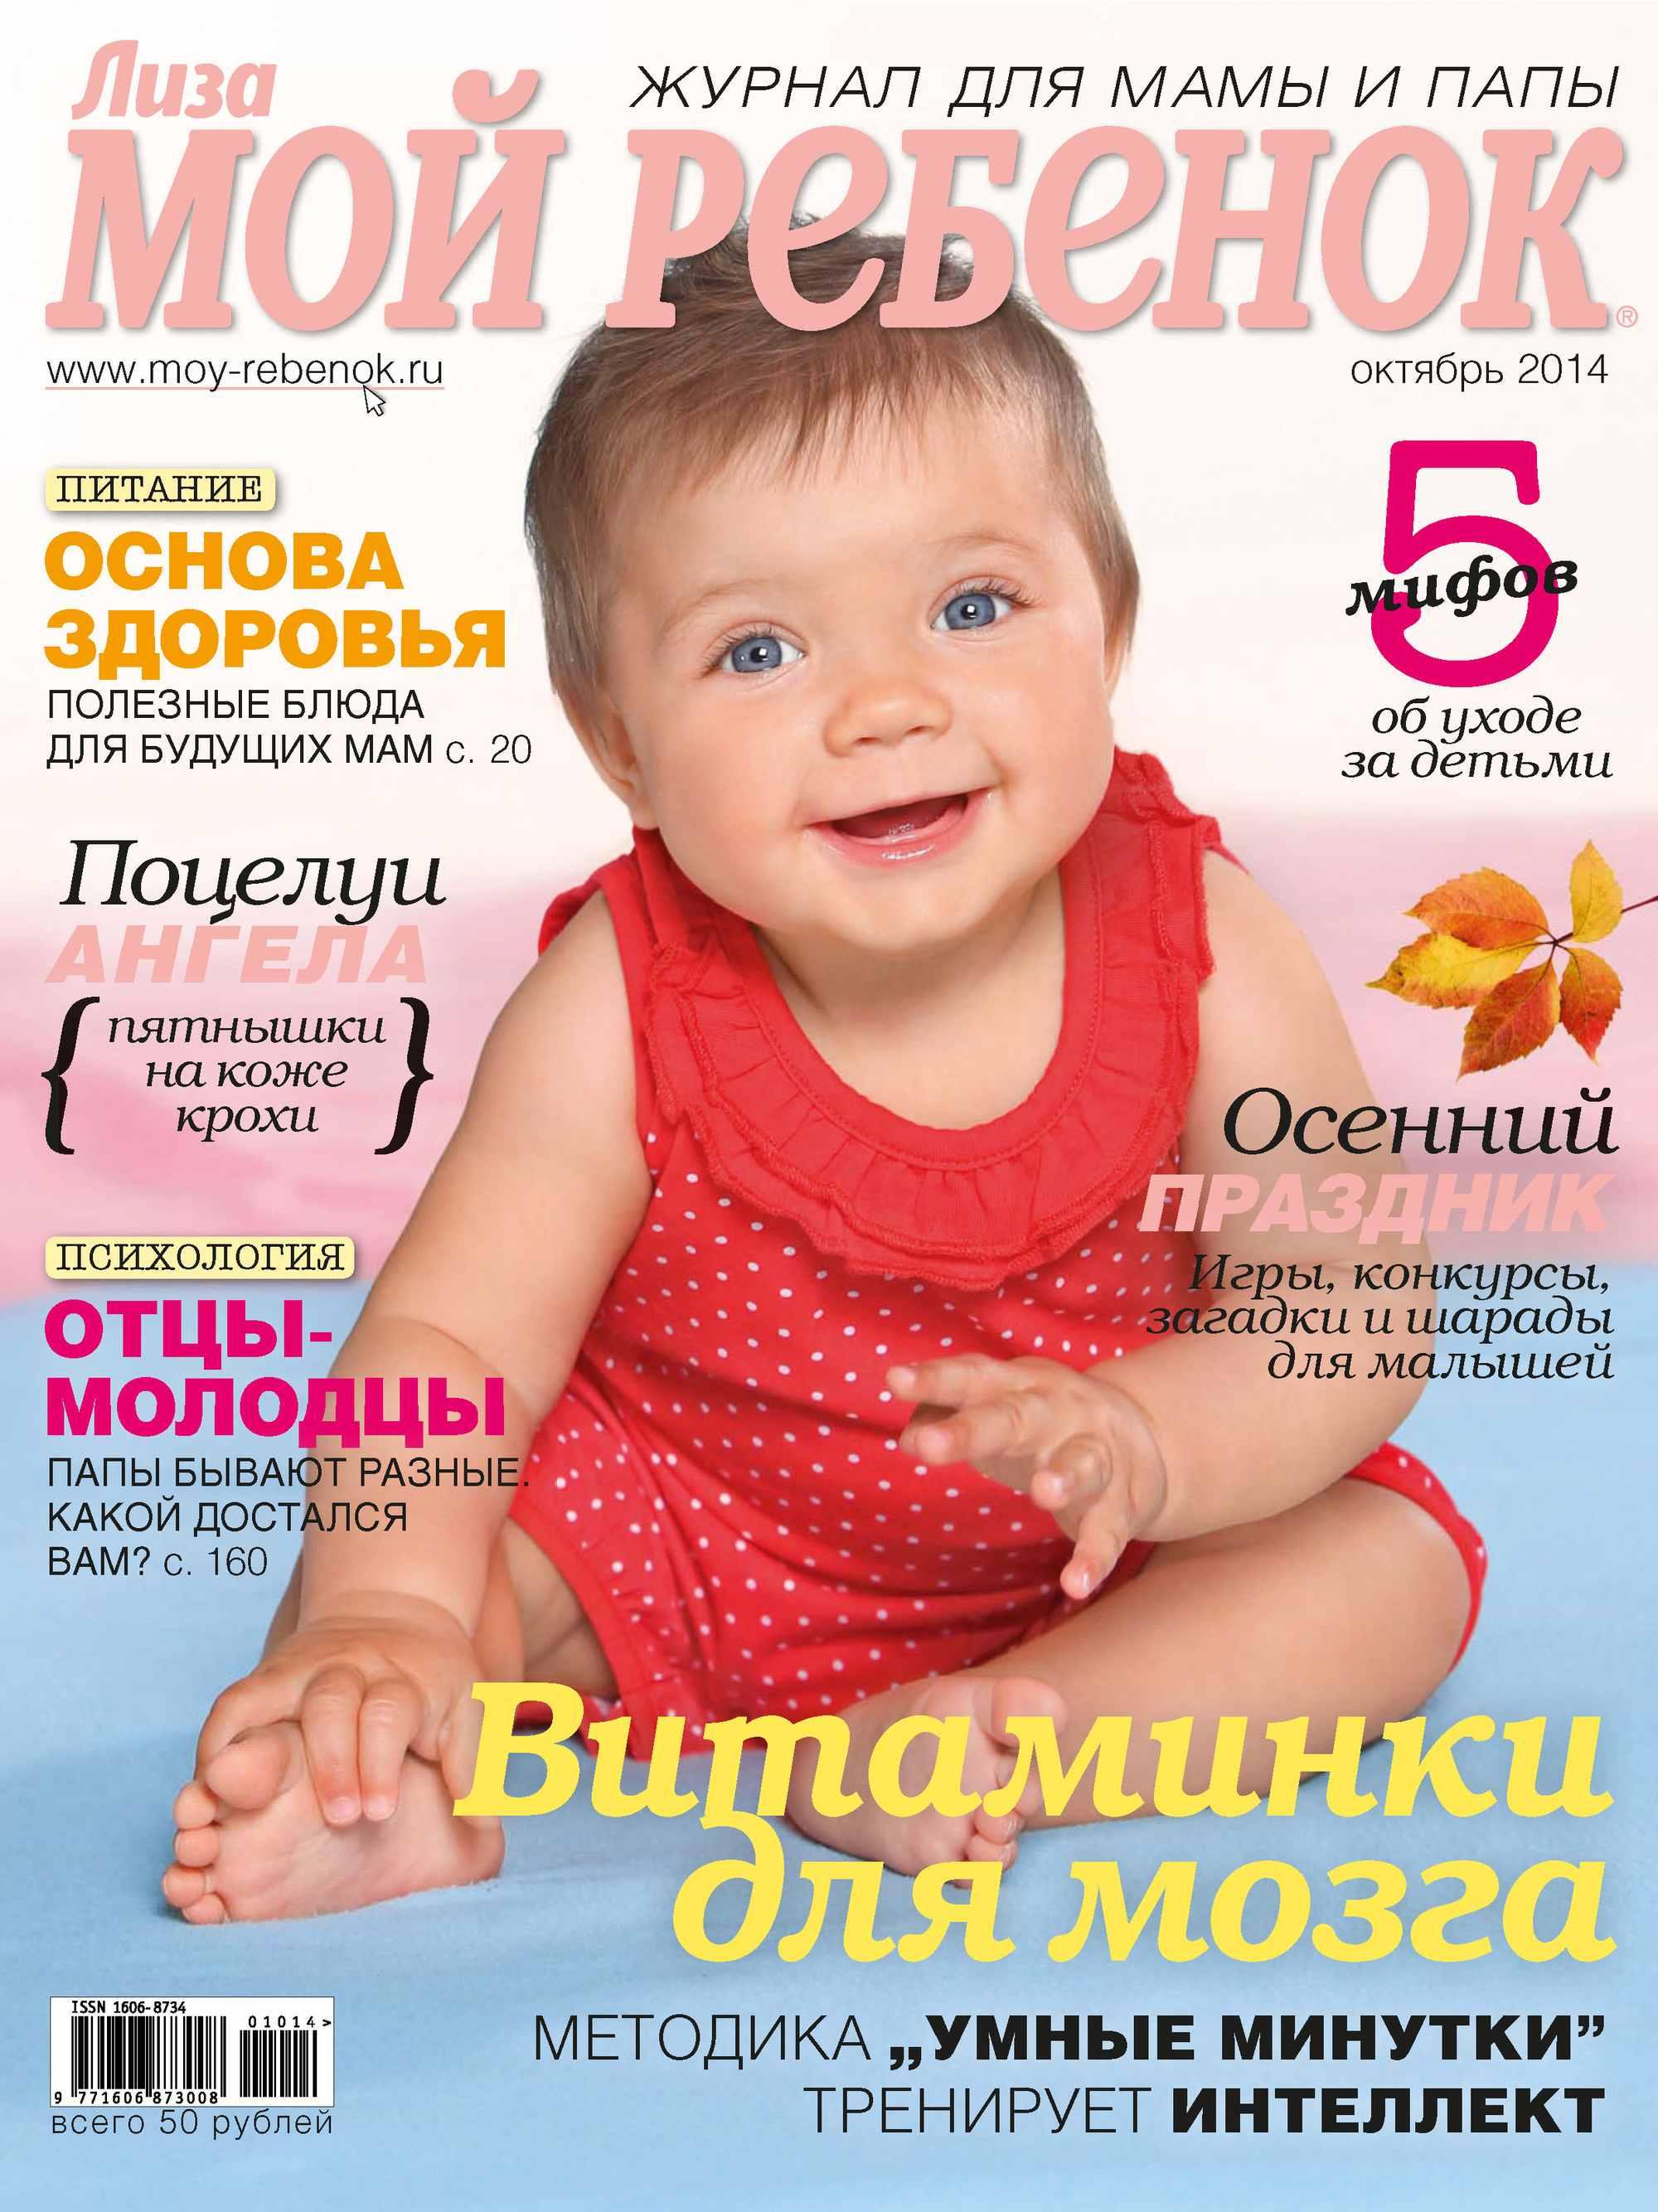 ИД «Бурда» Журнал «Лиза. Мой ребенок» №10/2014 ид бурда журнал лиза мой ребенок 11 2014